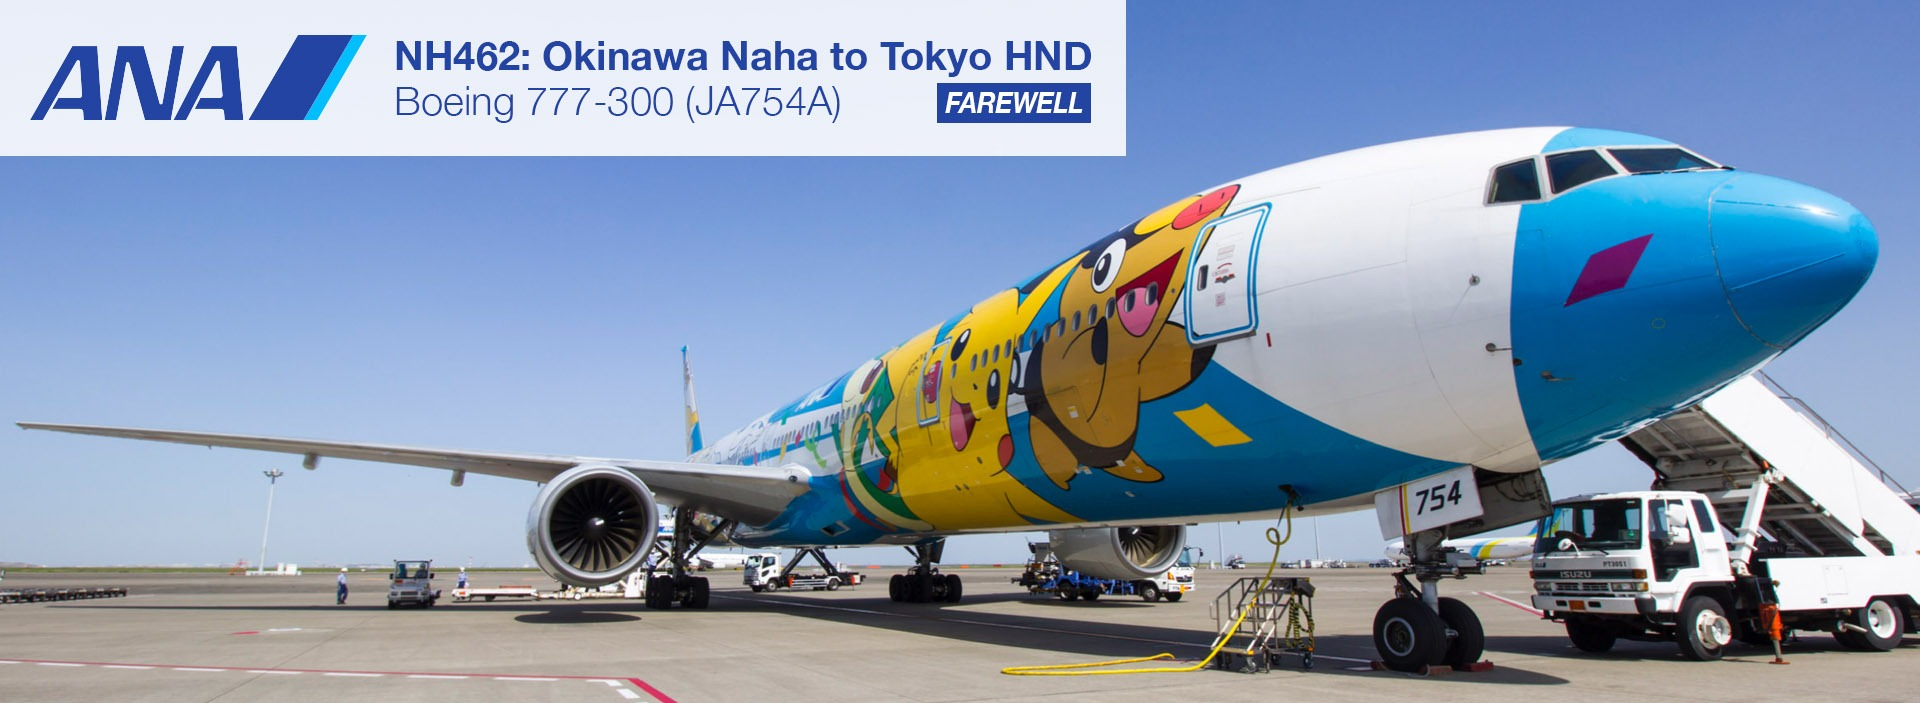 ANA Boeing 777-300 Domestic Economy Class (Naha - Tokyo)